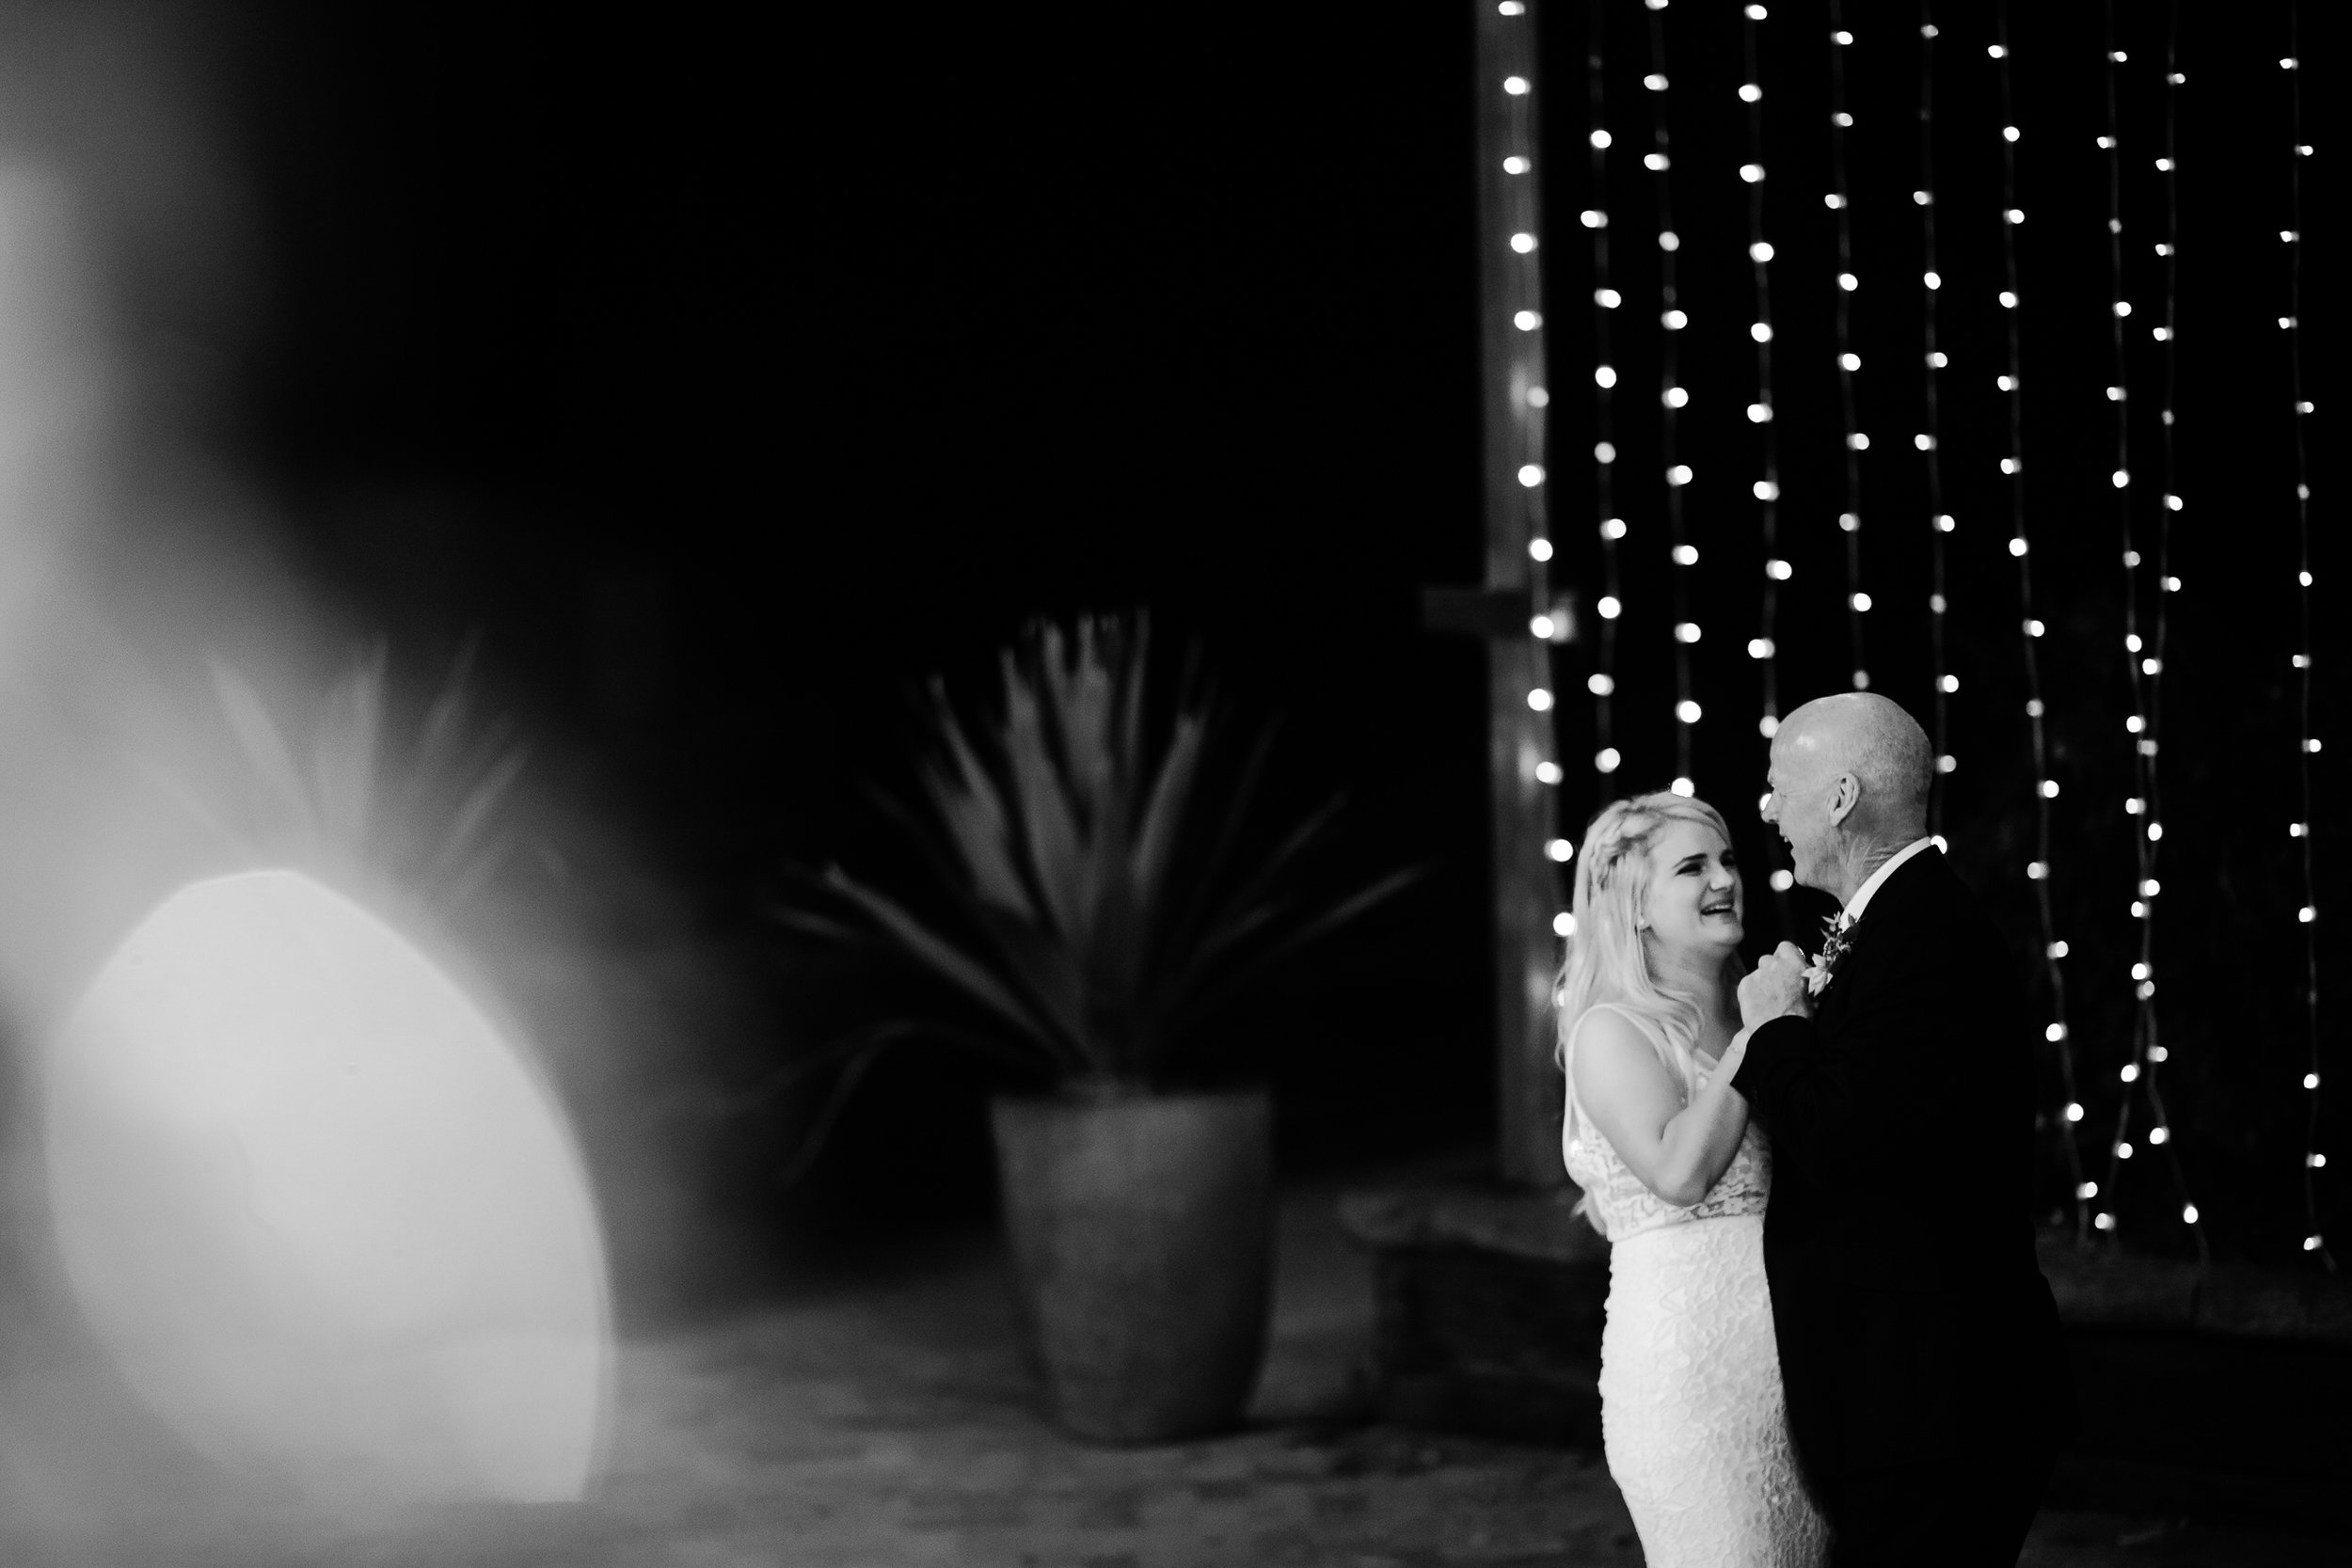 Justin_And_Jim_Photography_Byron_Bay_Wedding109.JPG